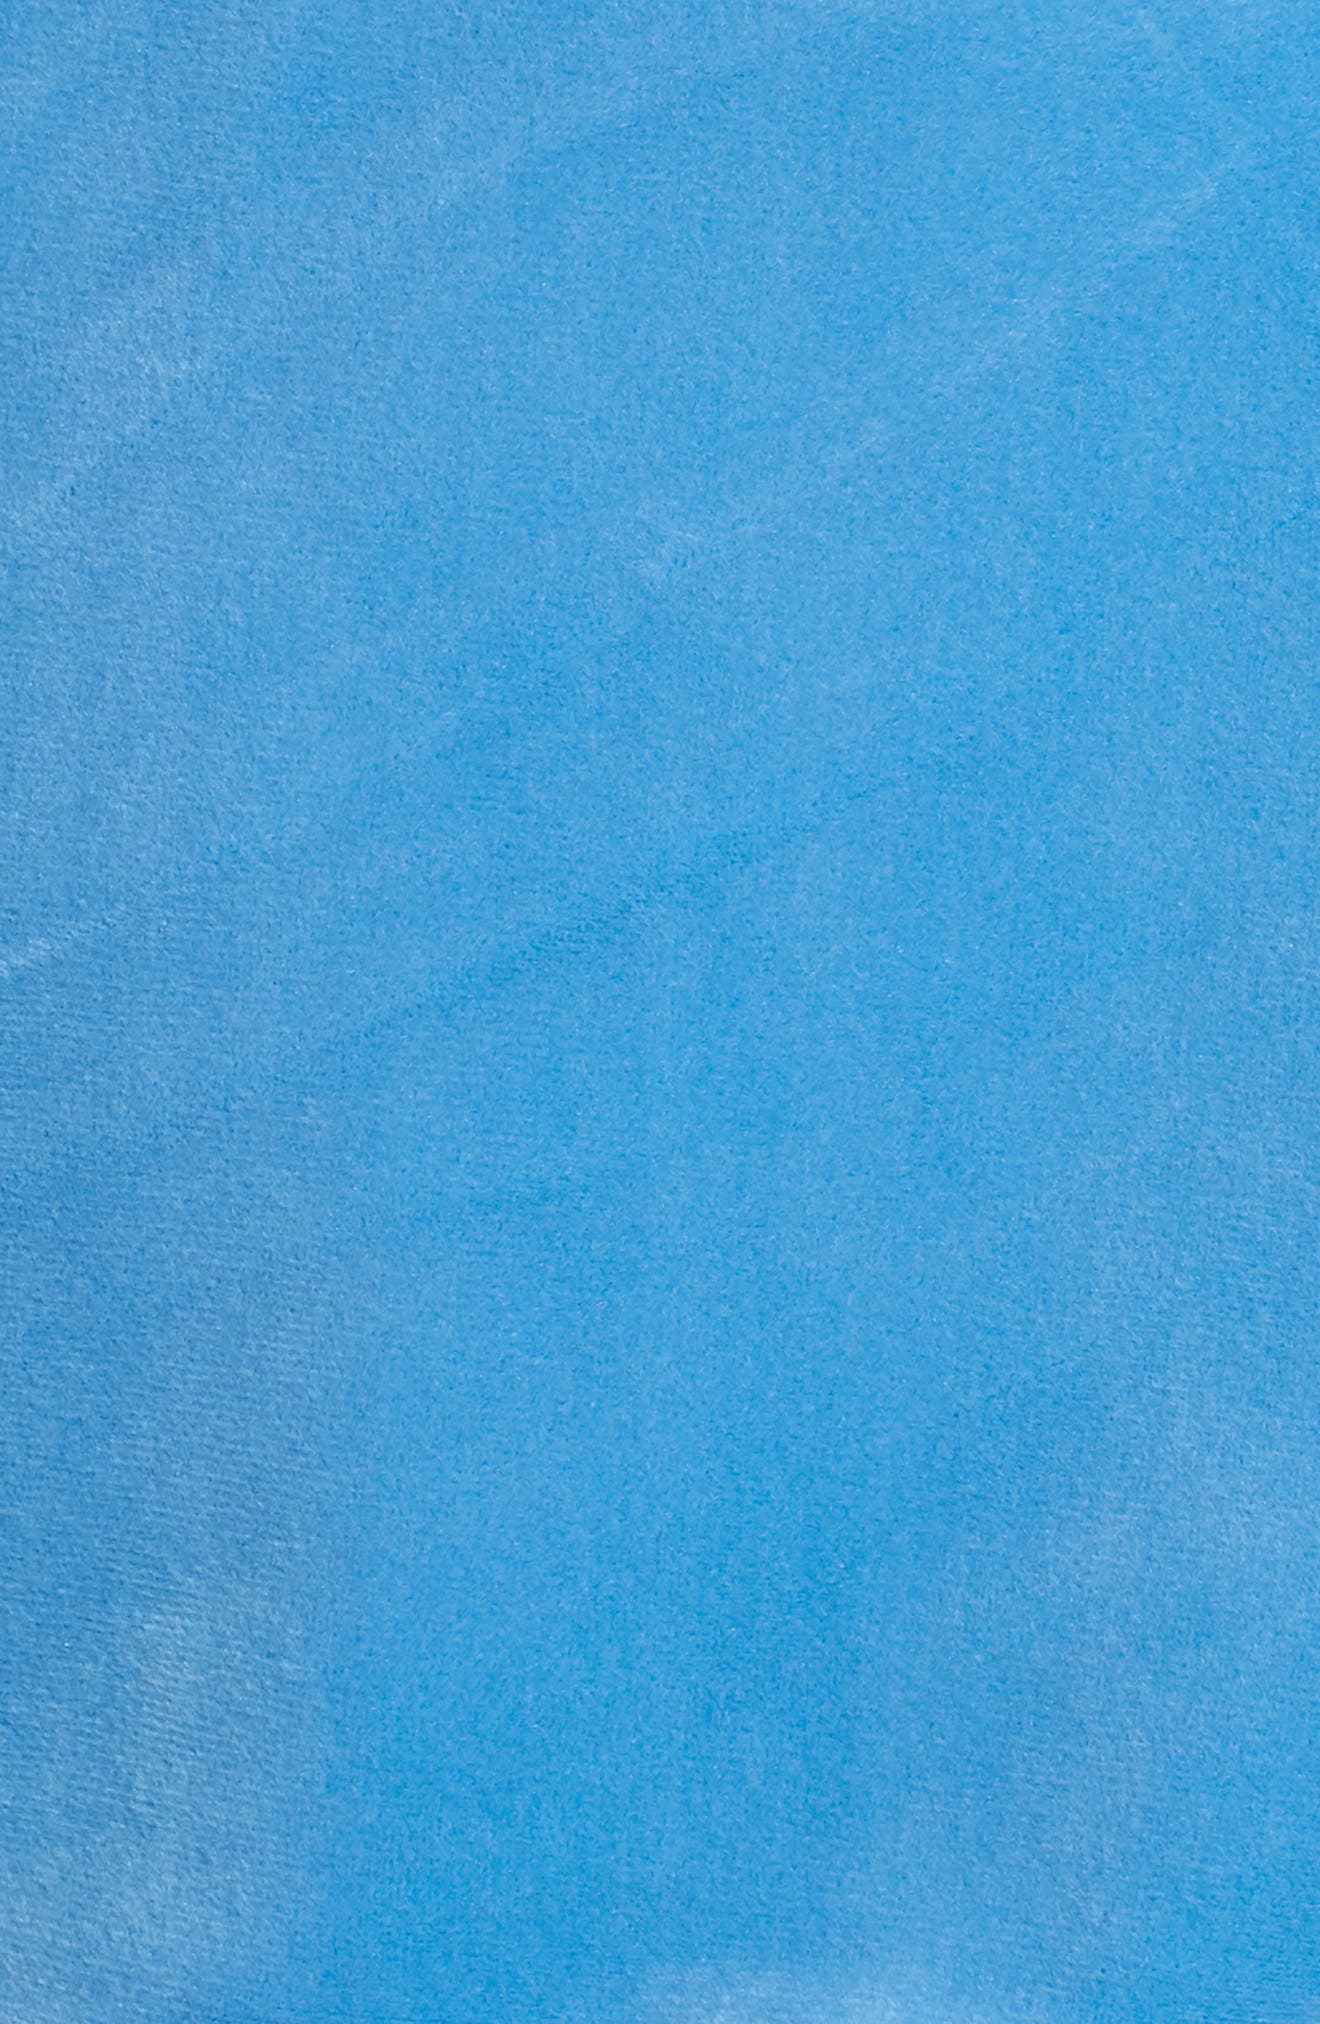 Asher Velour Hoodie Sweatshirt,                             Alternate thumbnail 5, color,                             Silver Lake Blue